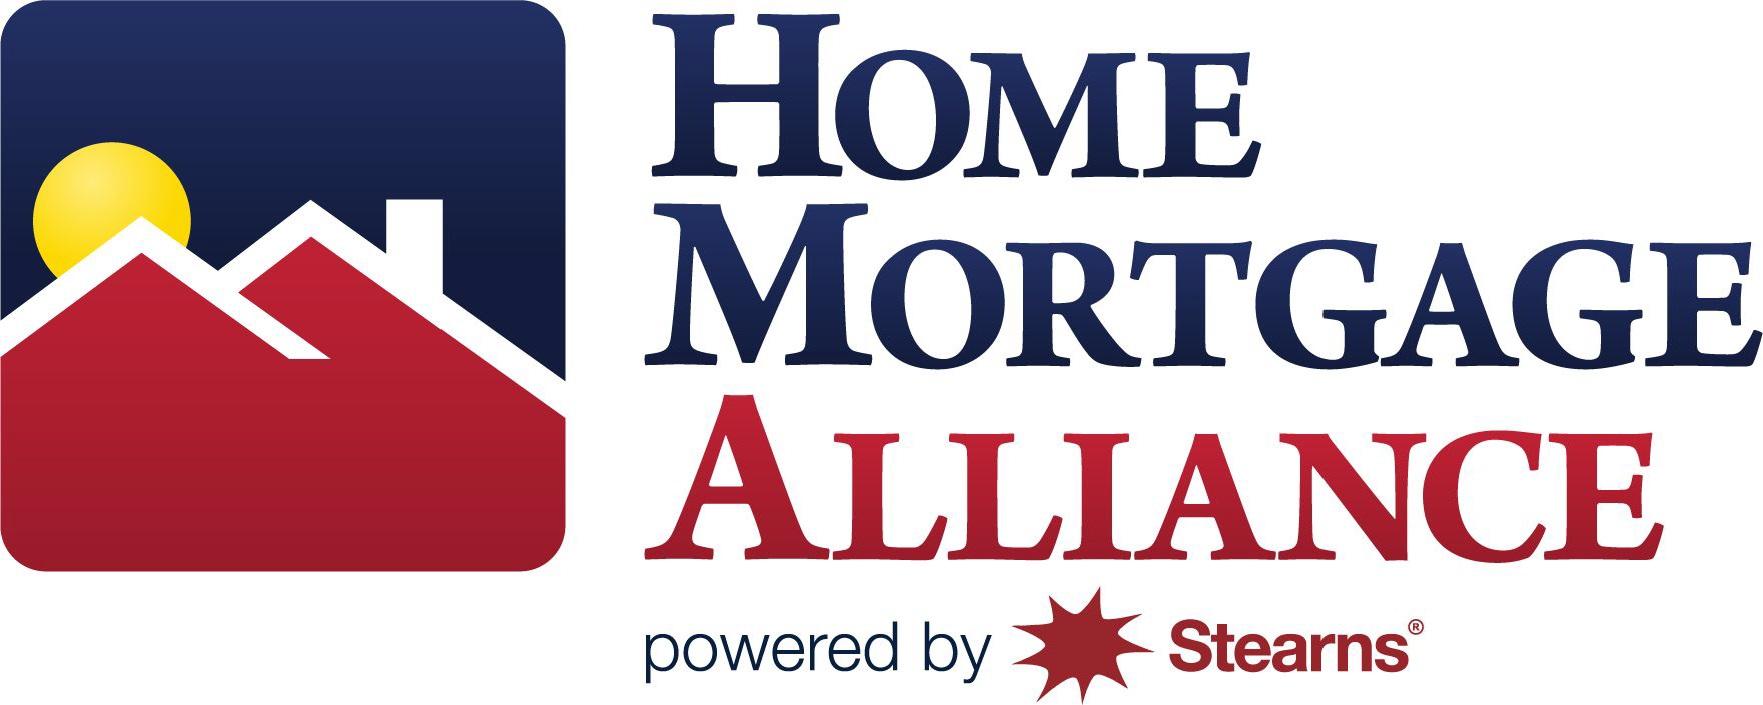 Home Mortgage Alliance, LLC logo